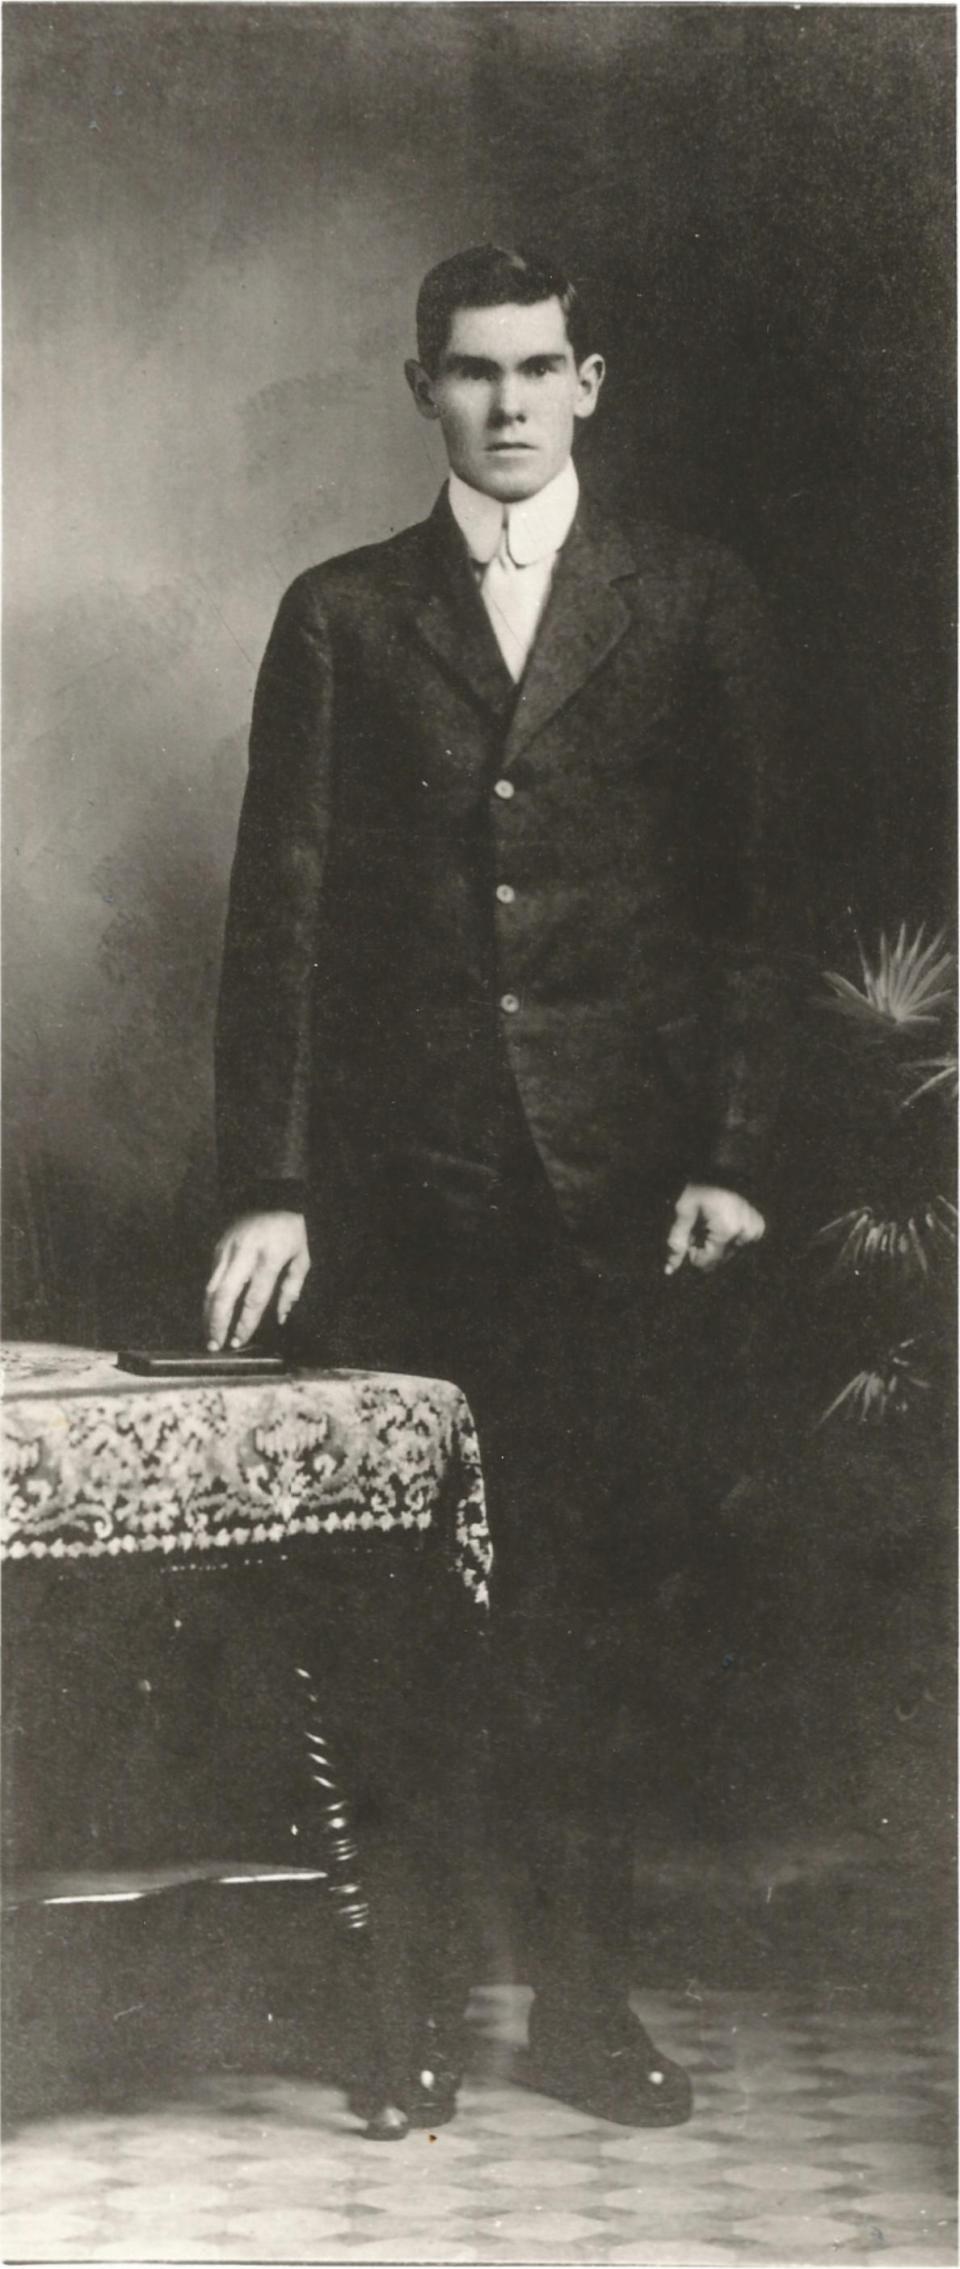 James Douglas McAdam, nd.